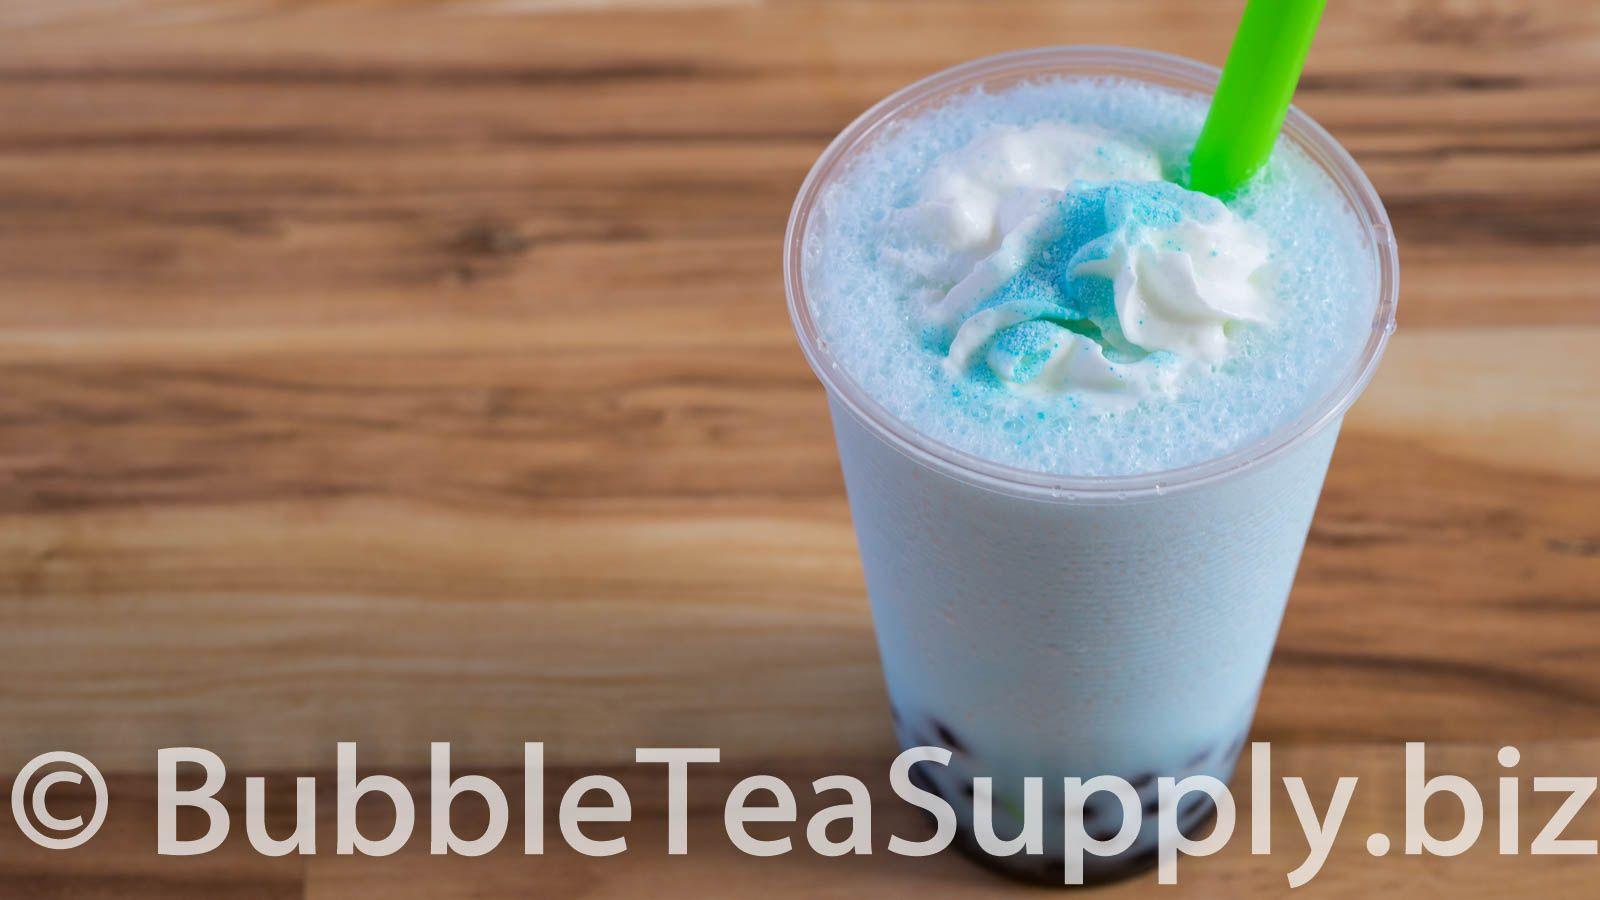 how to make blue hawaii bubble tea with vodka and boba tapioca pearls bubble tea supply blog recipe bubble tea bubble tea recipe bubble tea supplies how to make blue hawaii bubble tea with vodka and boba tapioca pearls